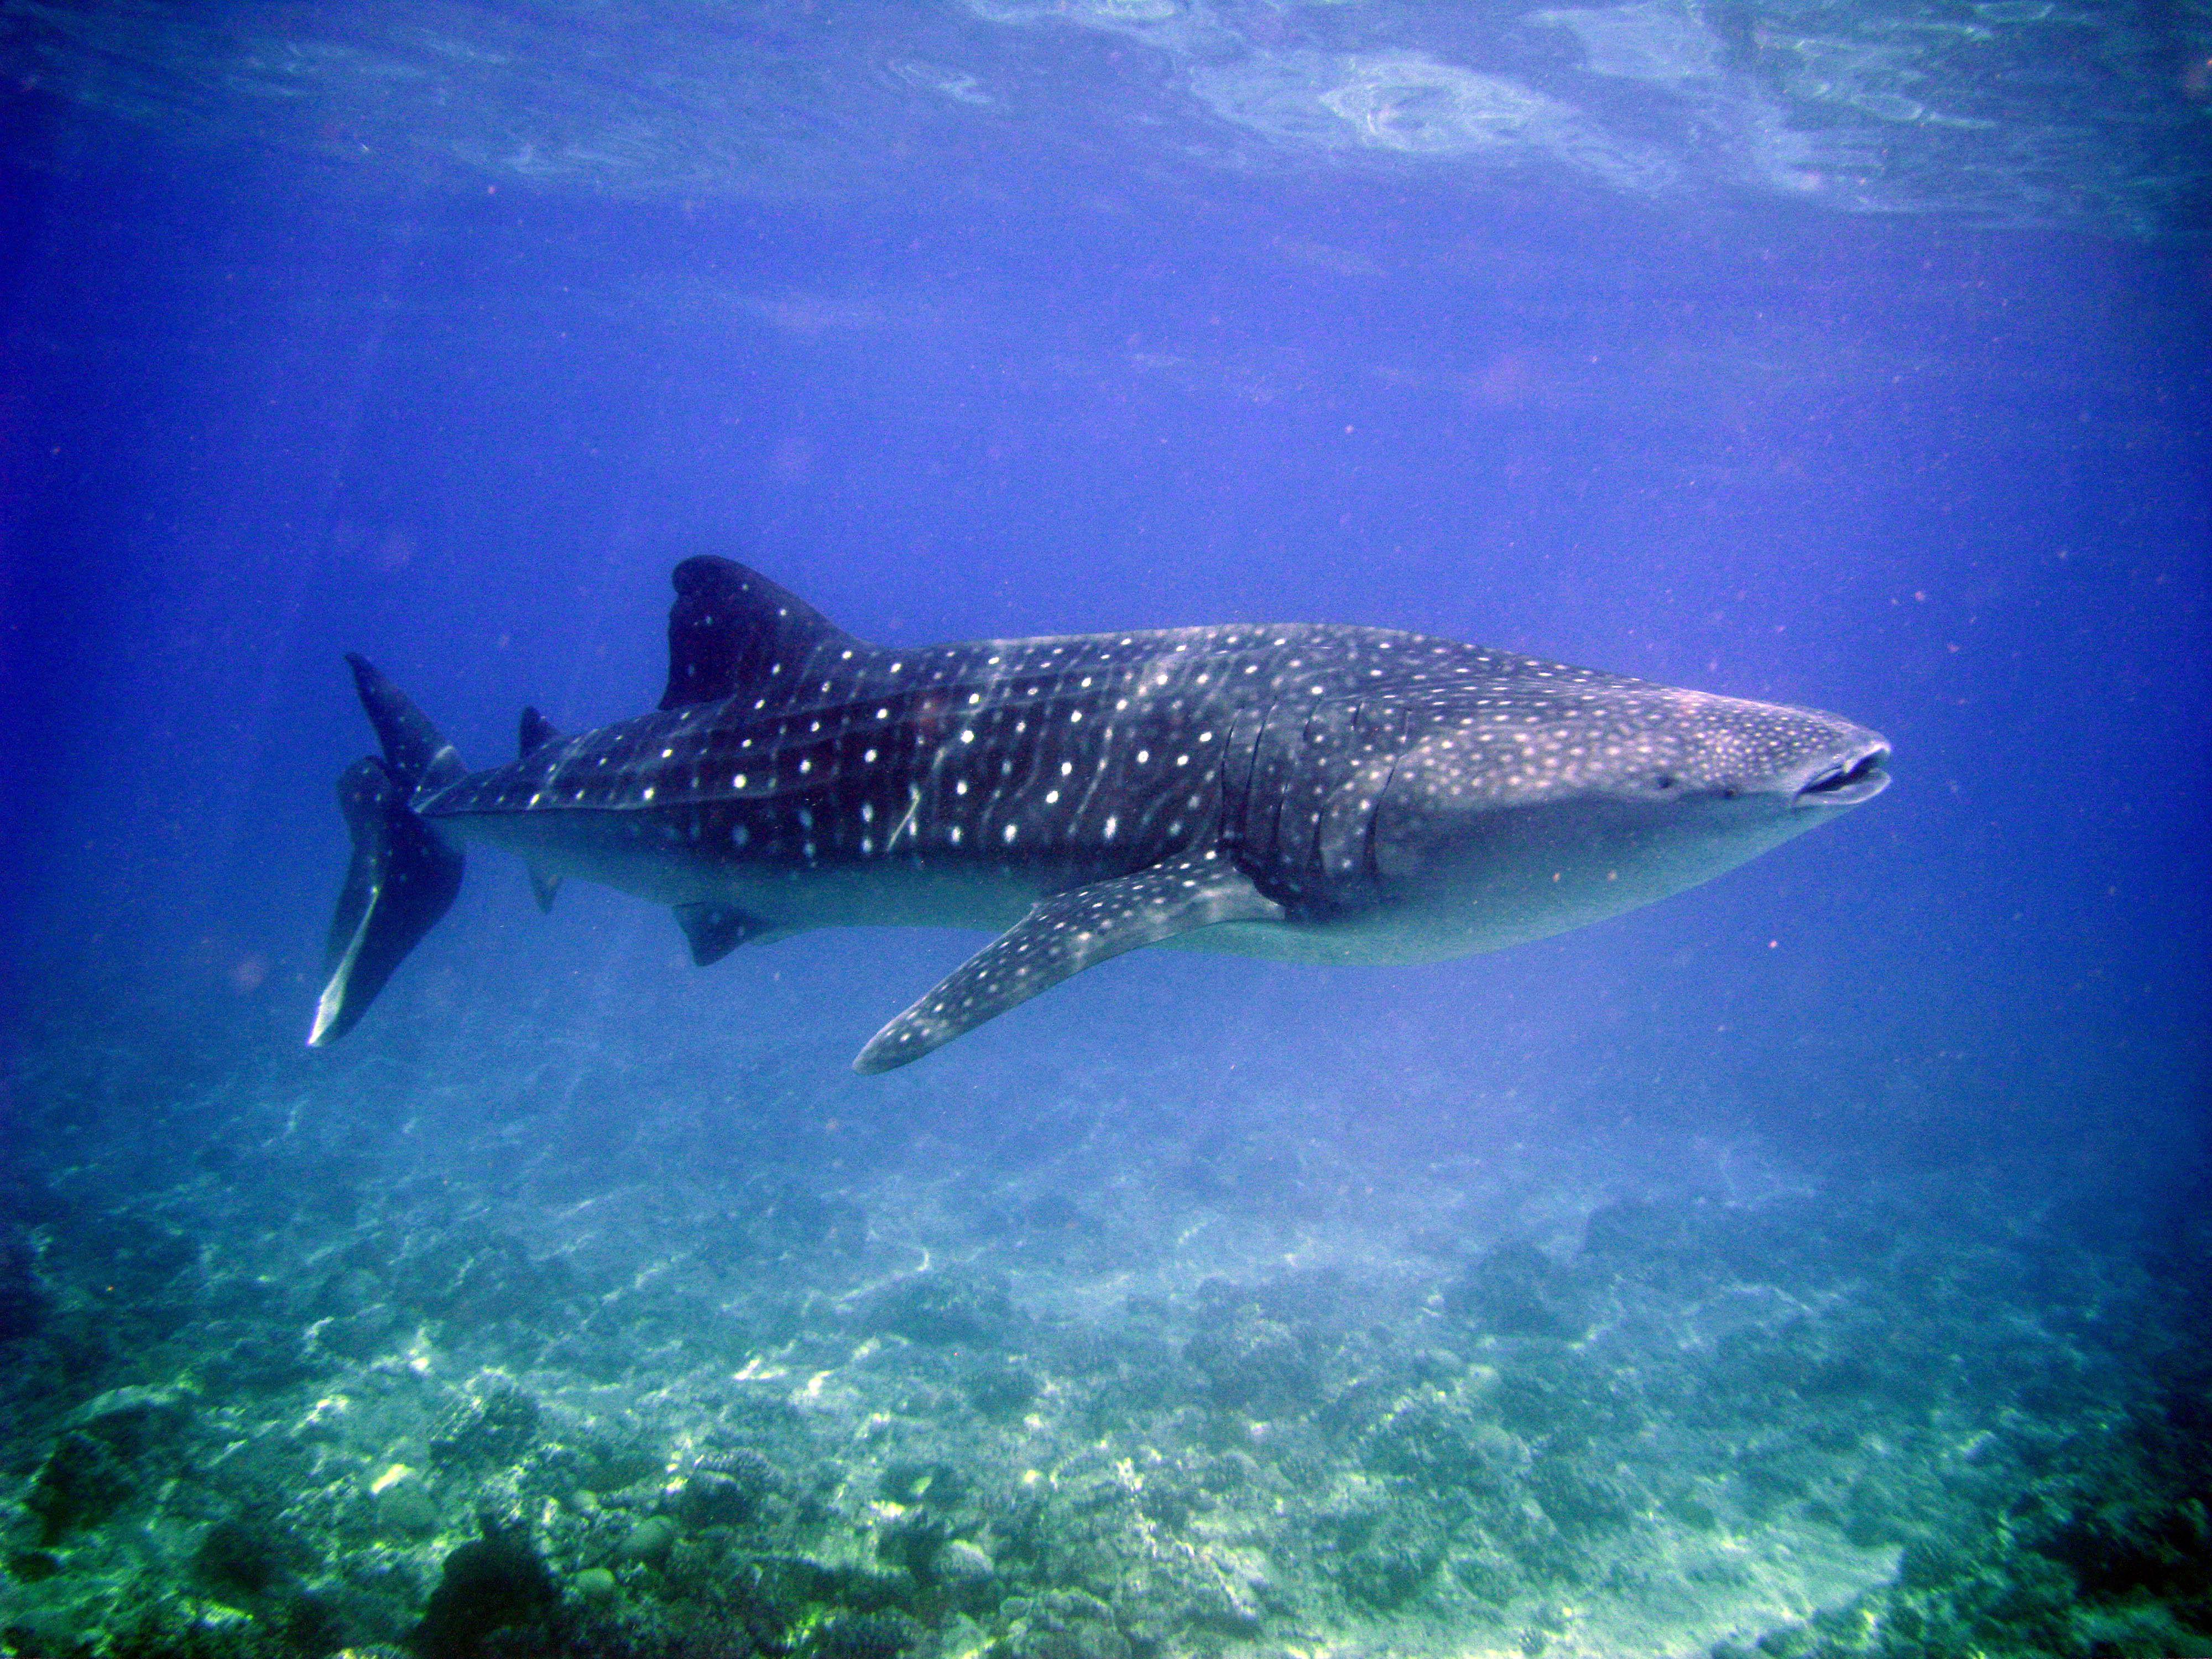 Bimini Sharklab 2018 All You Need To Know Before Go With Photos Tripadvisor